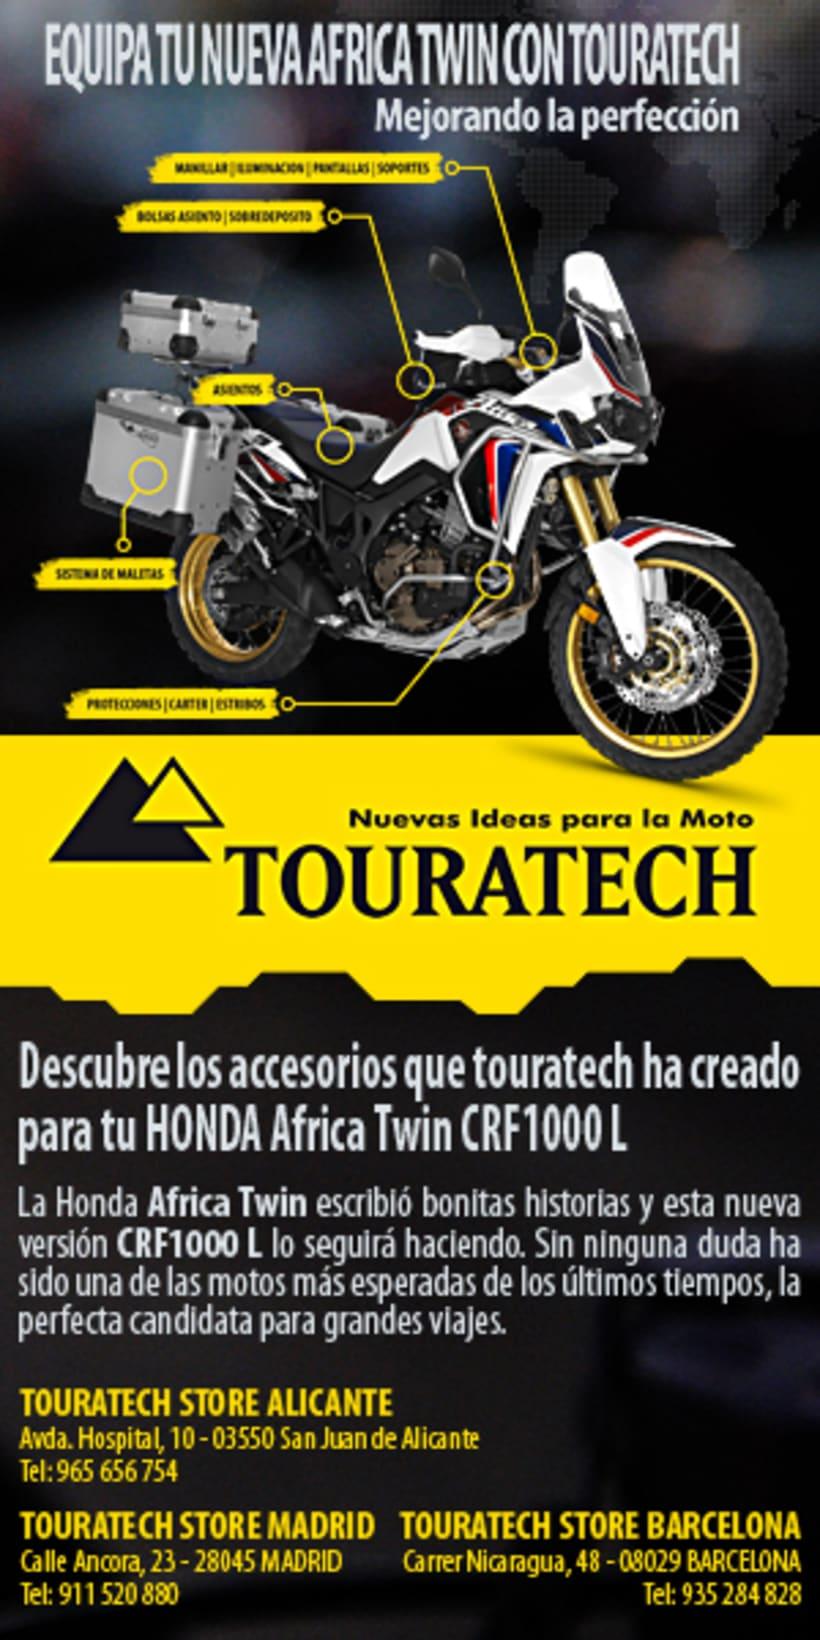 Hertz Ride Touratech - WEB 5